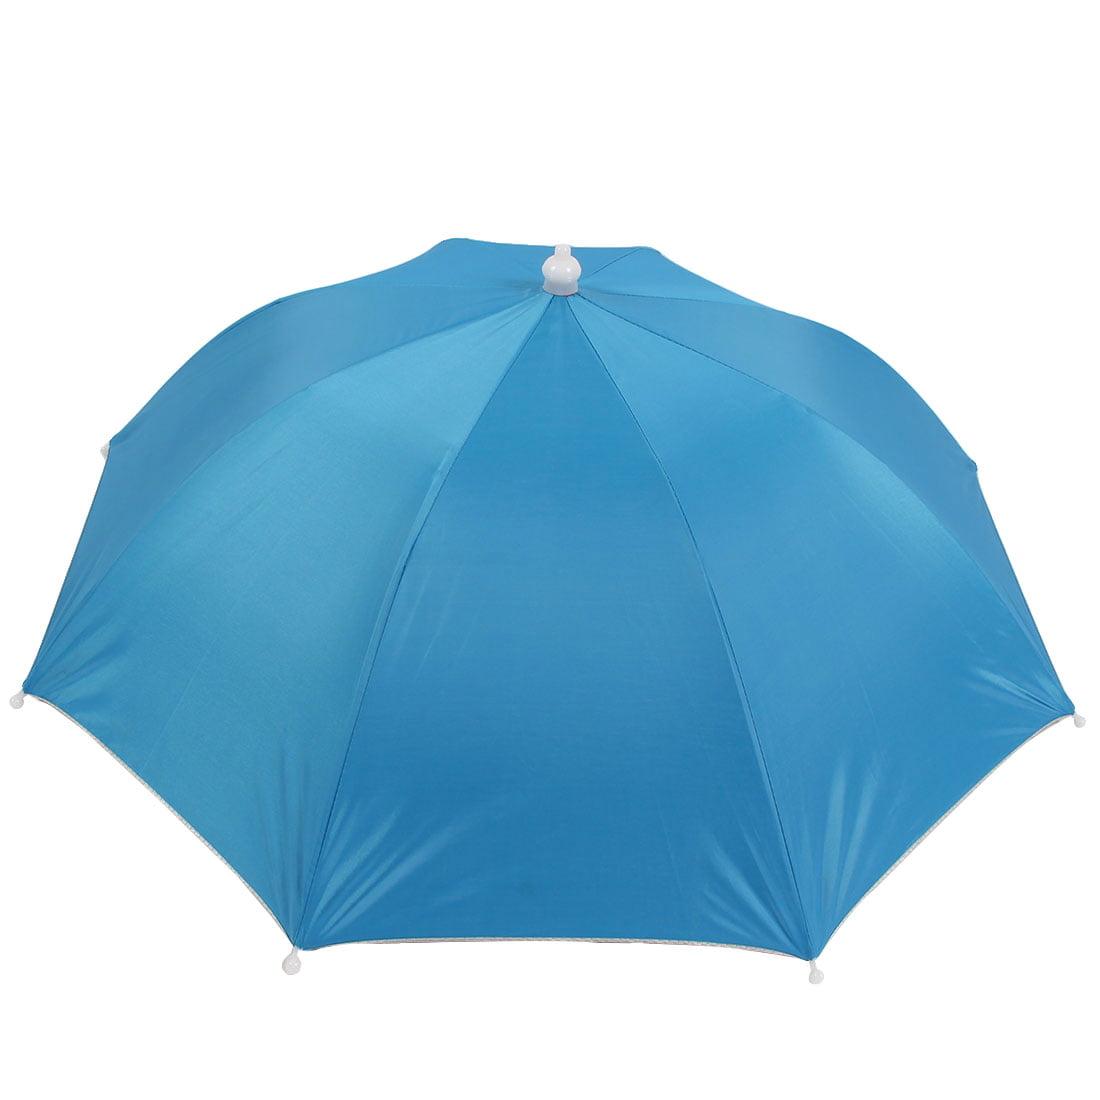 Blue Polyester Sun Rain Shade 8 Rib Headwear Umbrella Cap